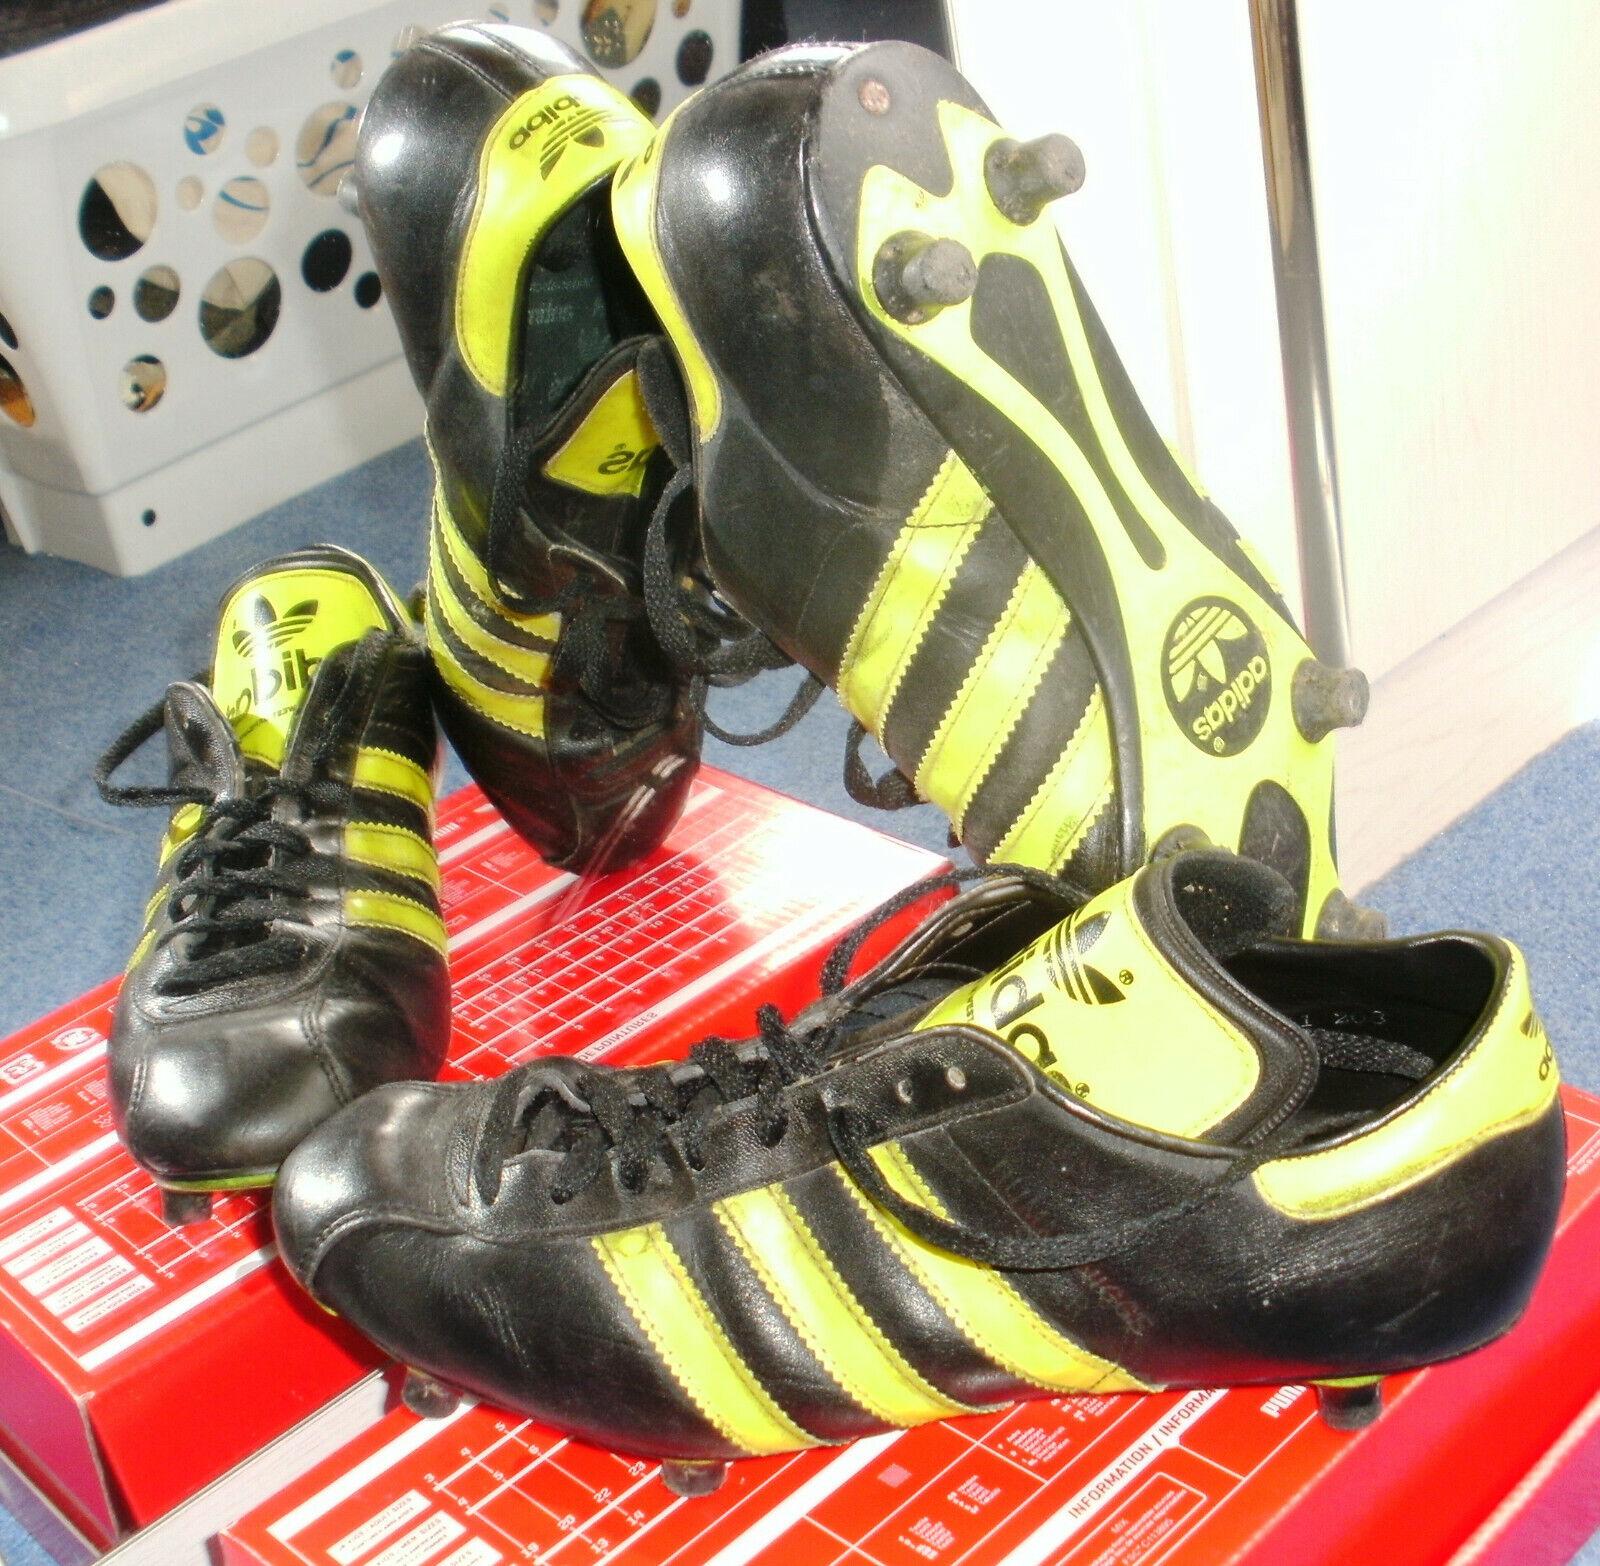 RARA da Collezione Sautope Adidas Sautope Calcio Rumuominiigge SUPER SG, Tg. 8